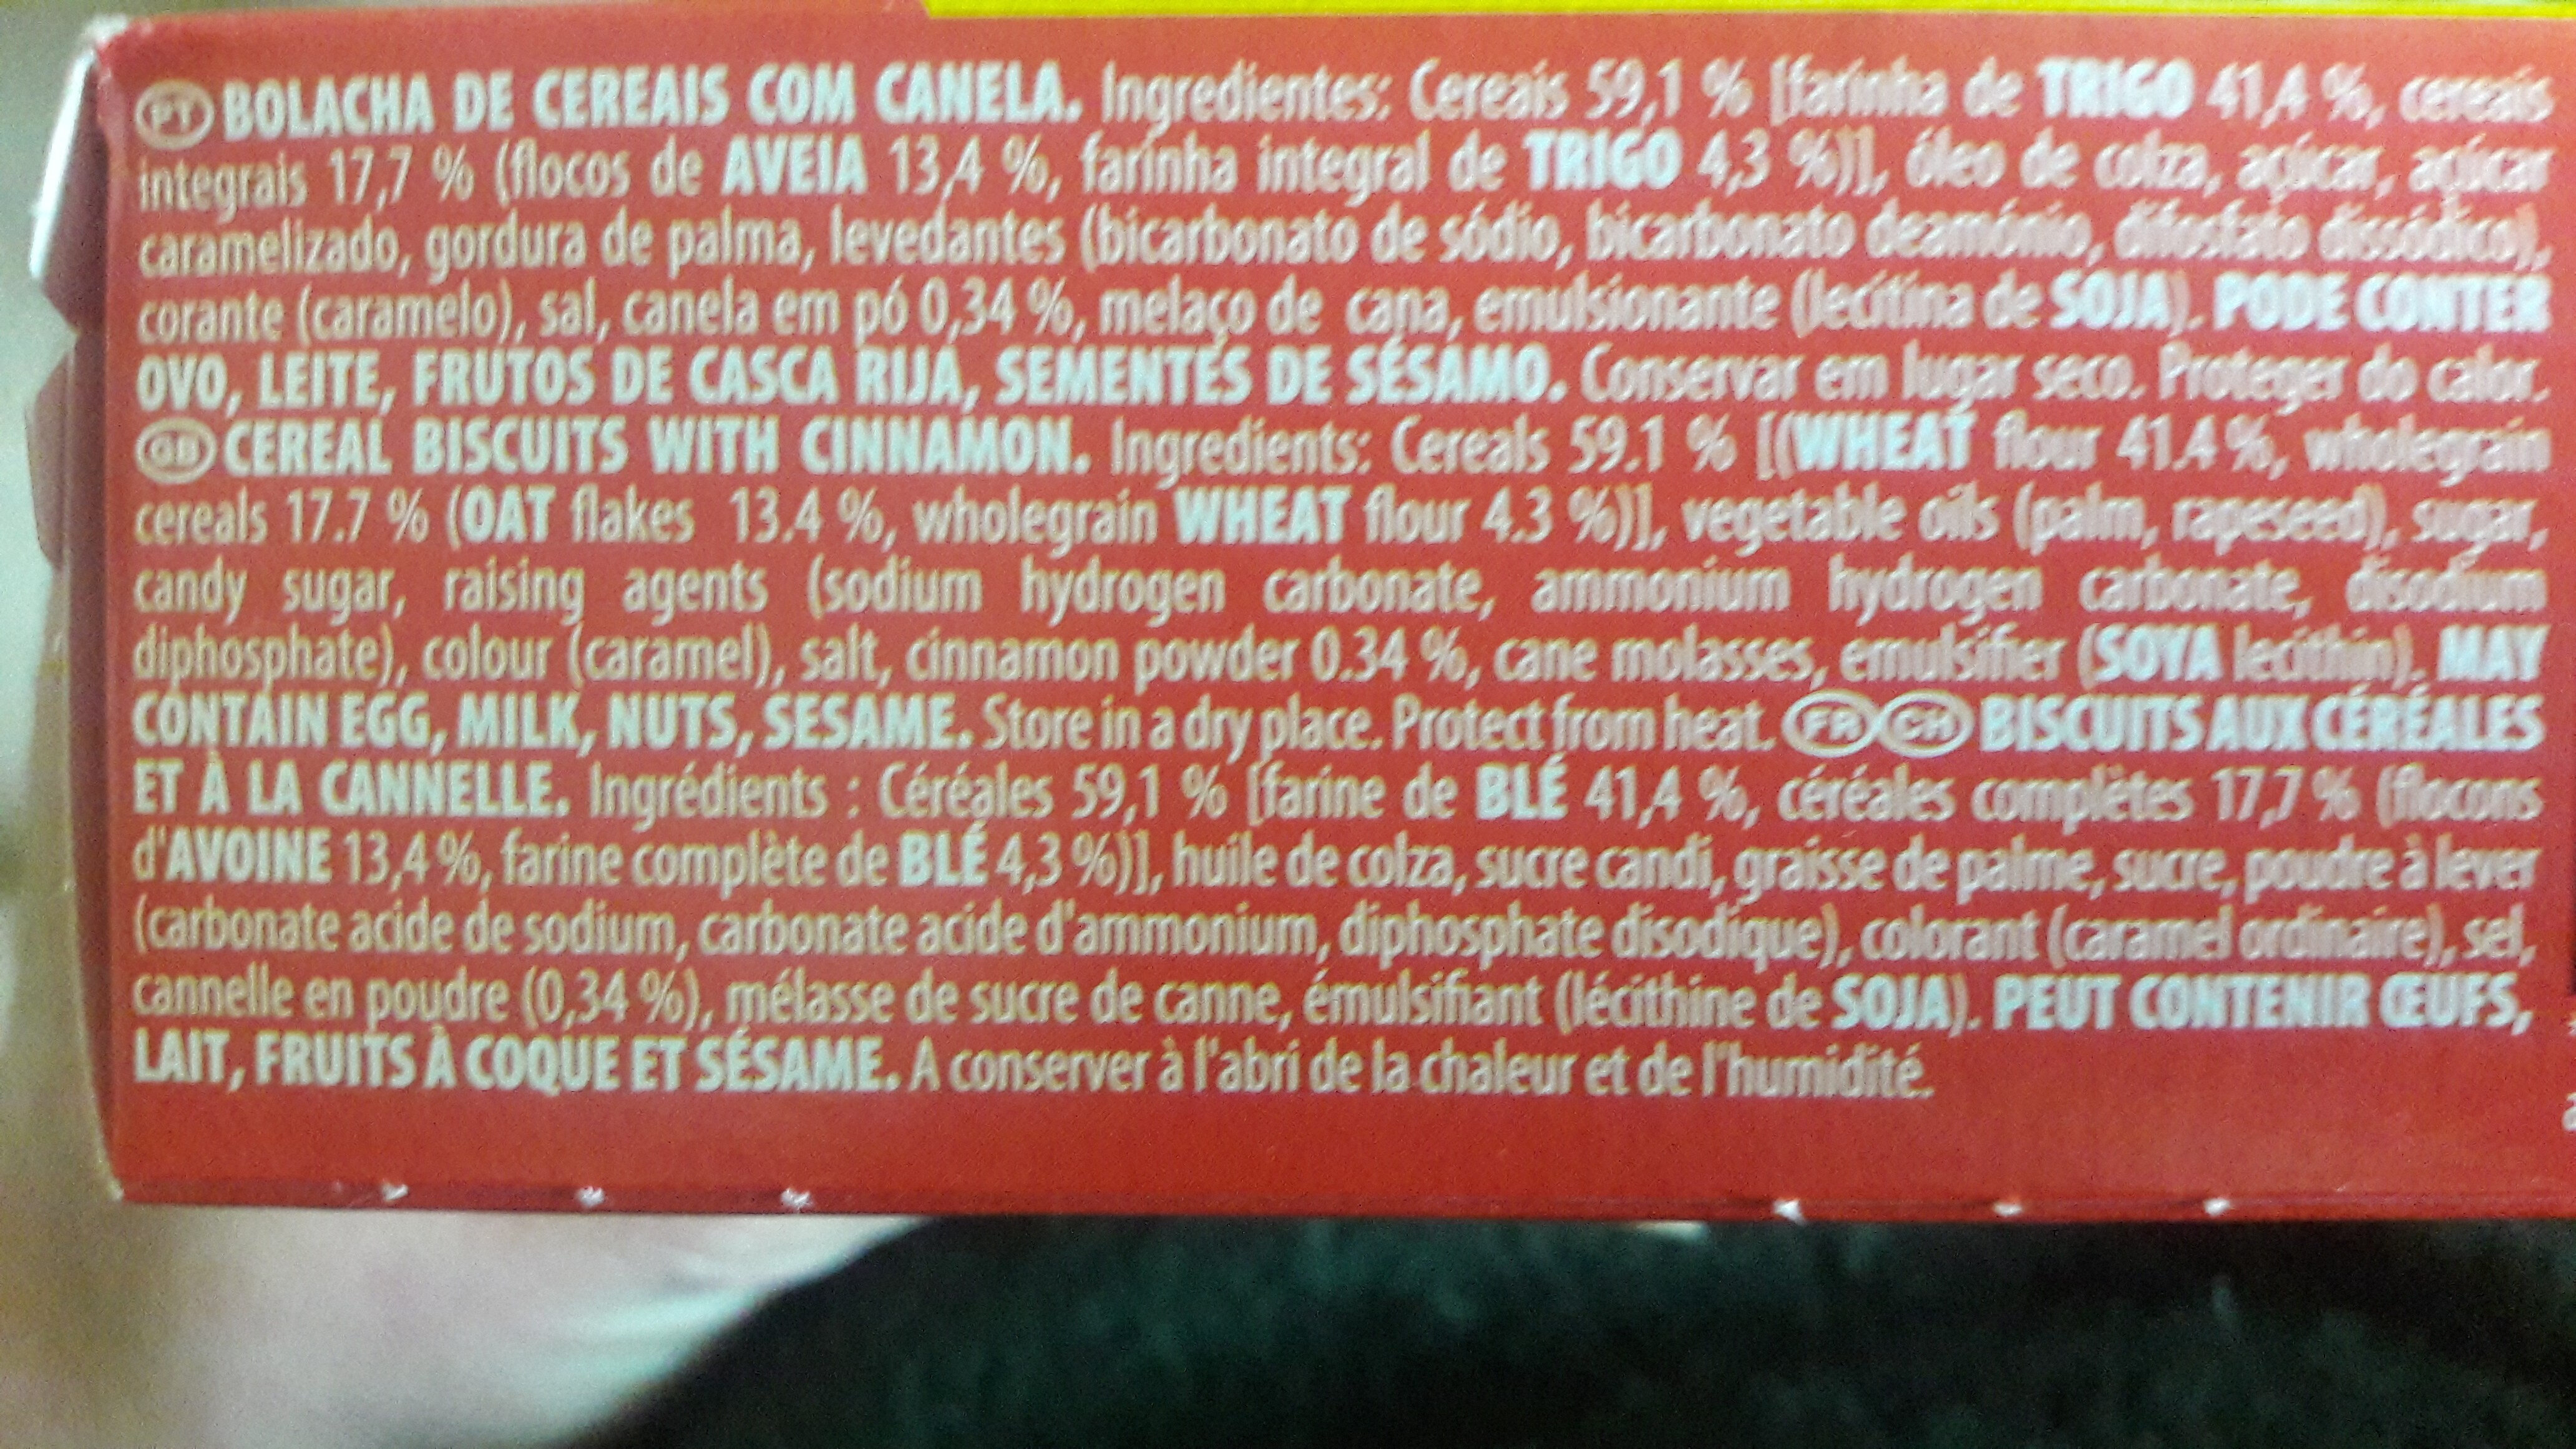 Bolacha triunfo digestive go canela - Ingrédients - fr